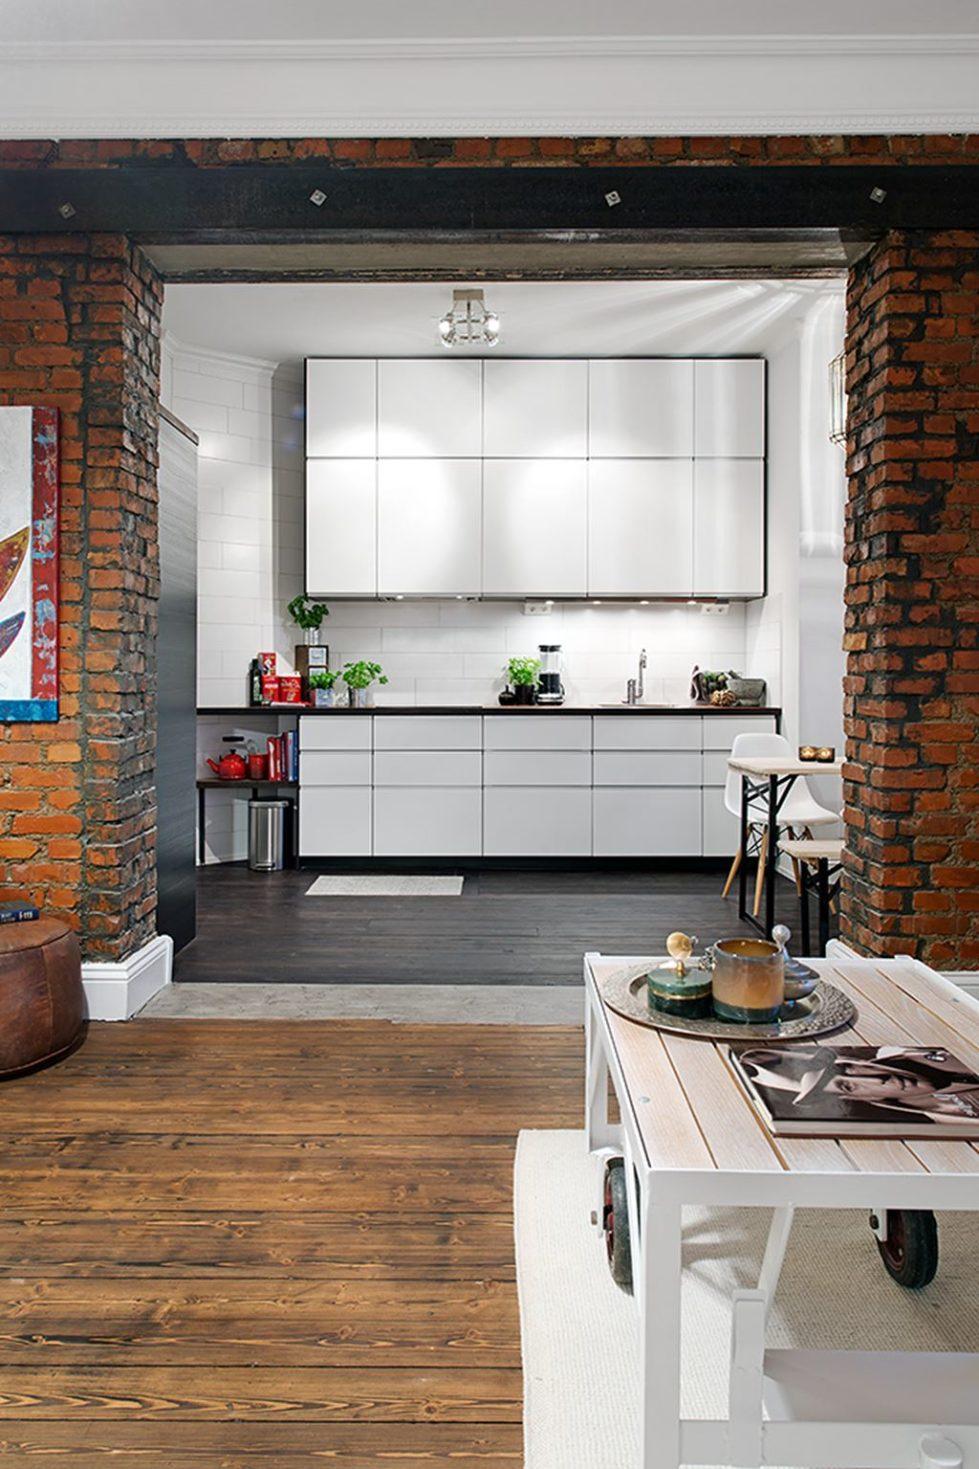 The Delightful Design of the Studio Flat Scandinavian Style - Kitchen 4